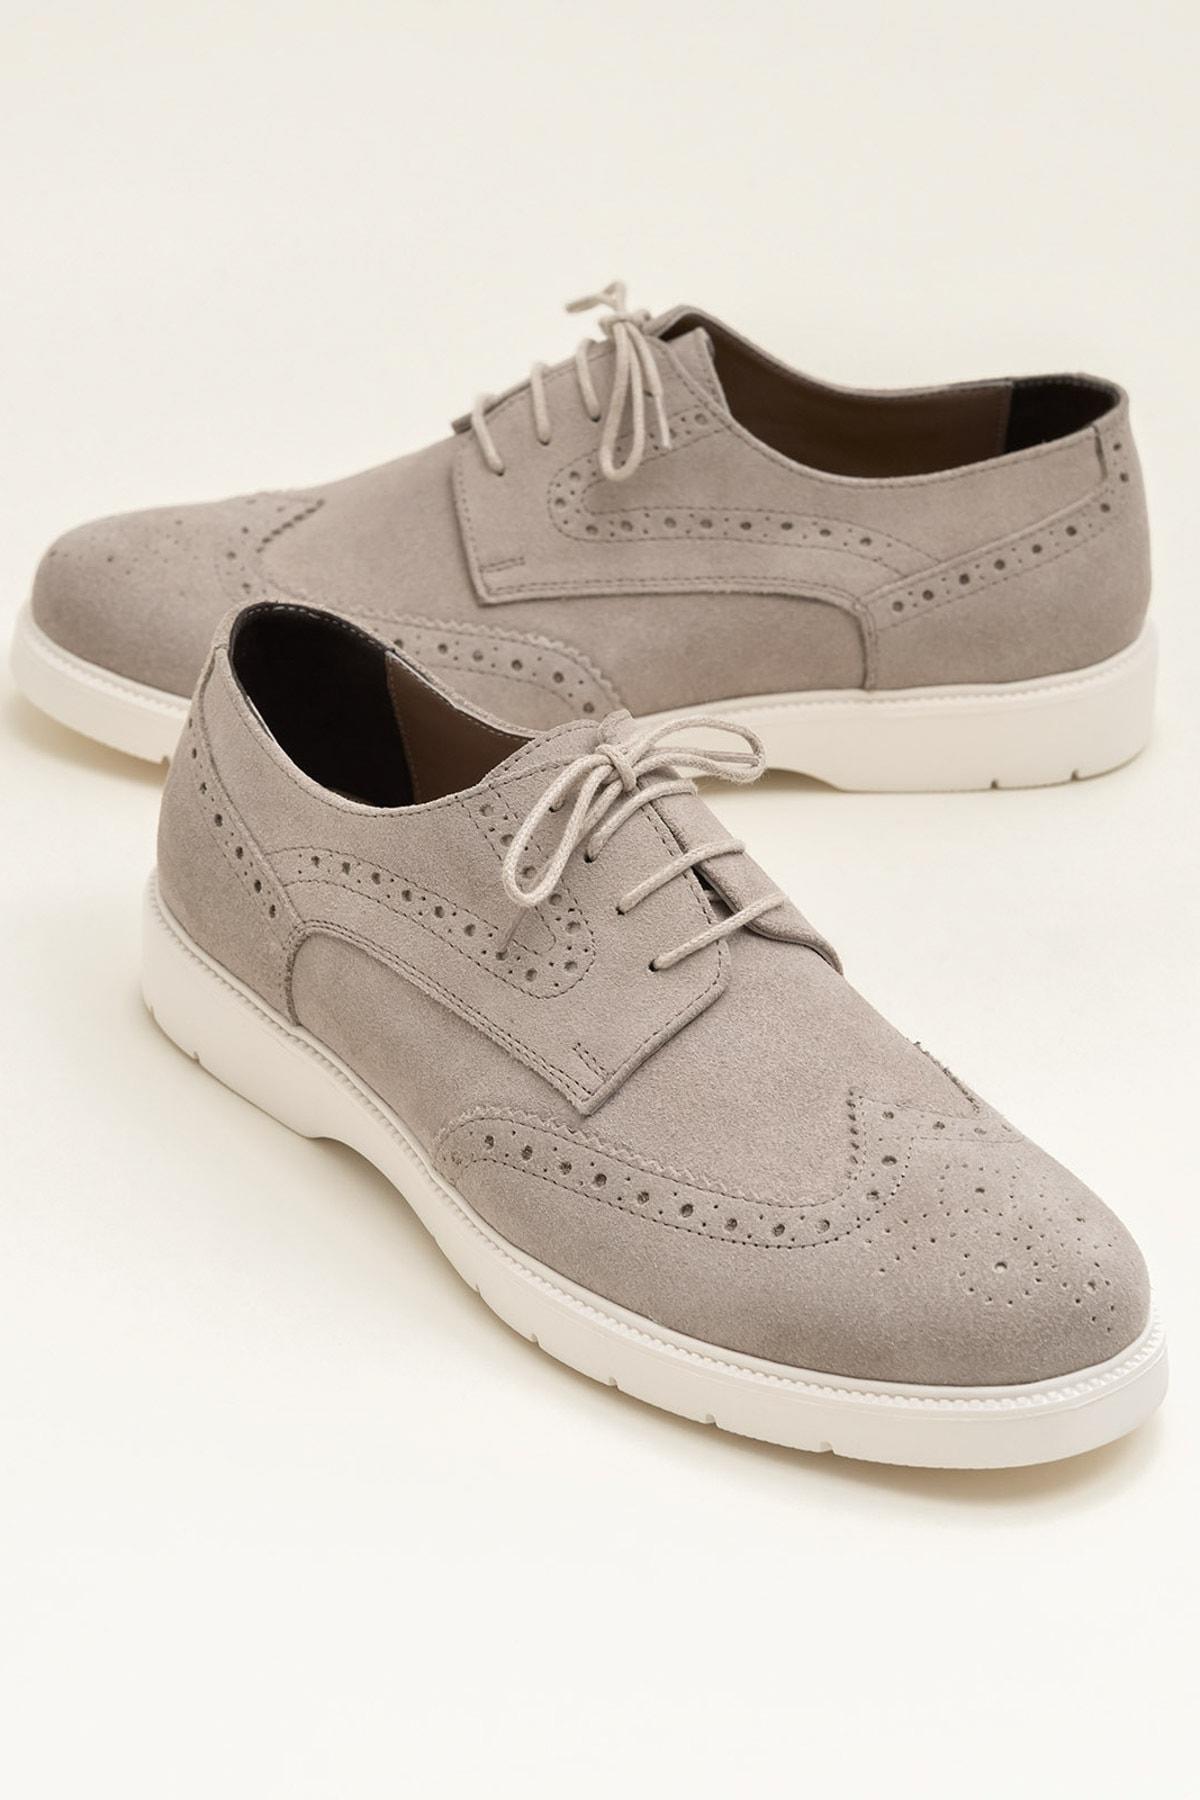 Elle Shoes AMBROSE Bej Erkek Ayakkabı 1